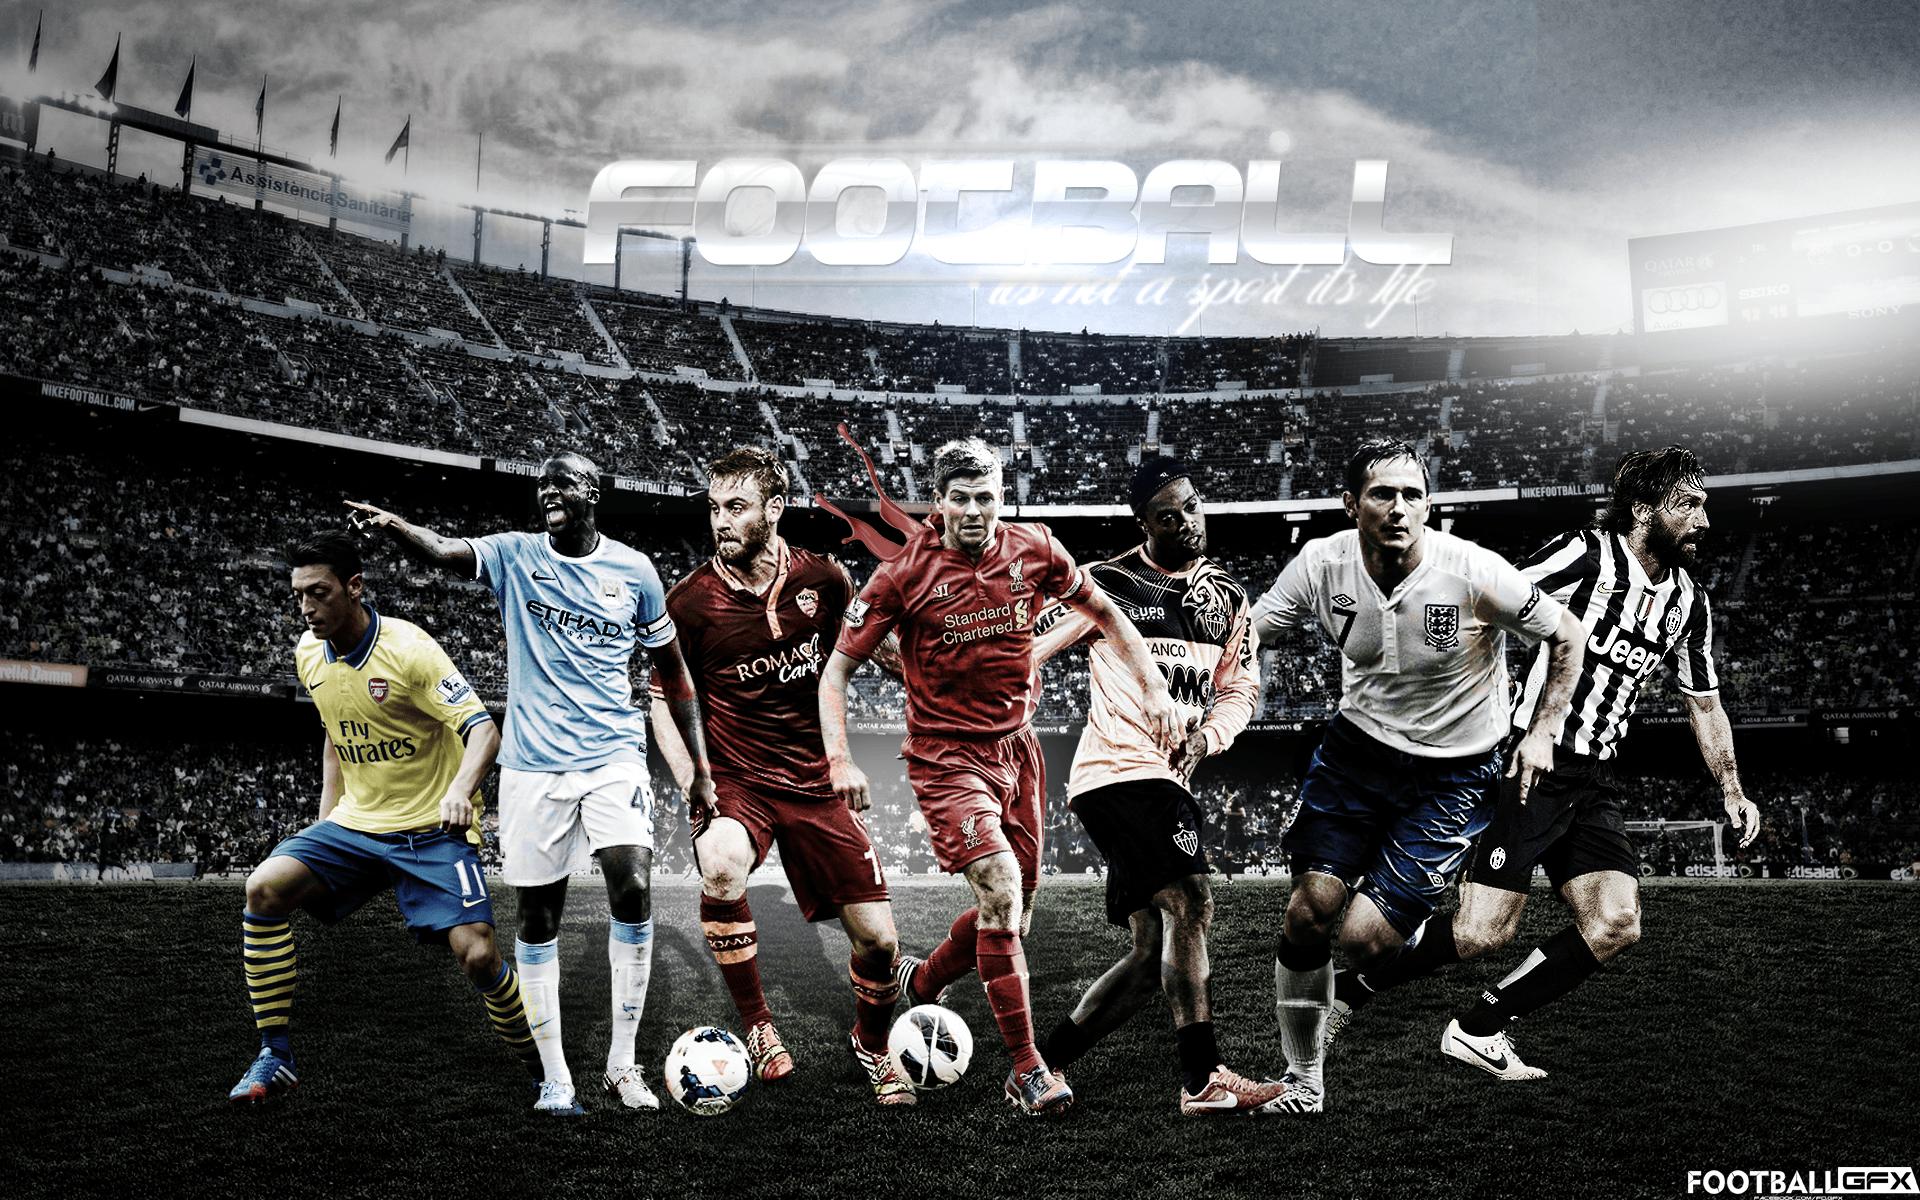 Football Wallpapers 4k 1 0 7 Apk: Football Stars Wallpapers